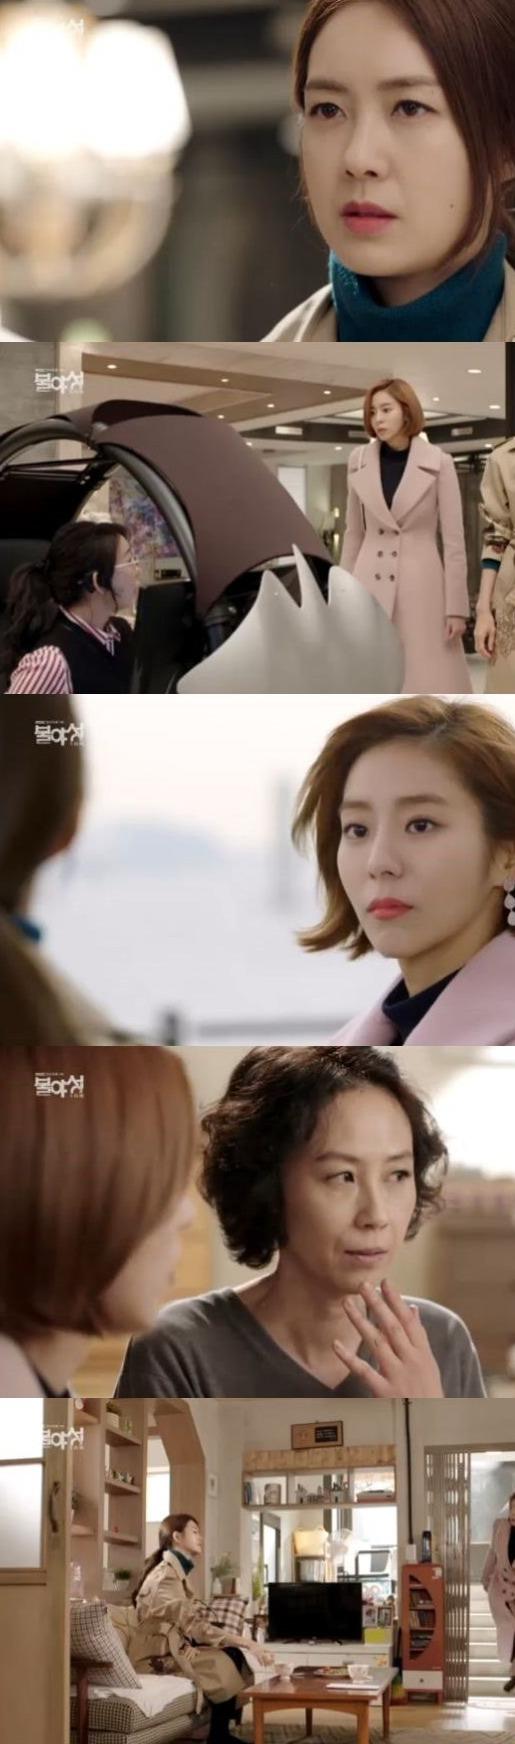 Night light korean drama synopsis - Broadcast Starting Date In Korea 2016 11 21